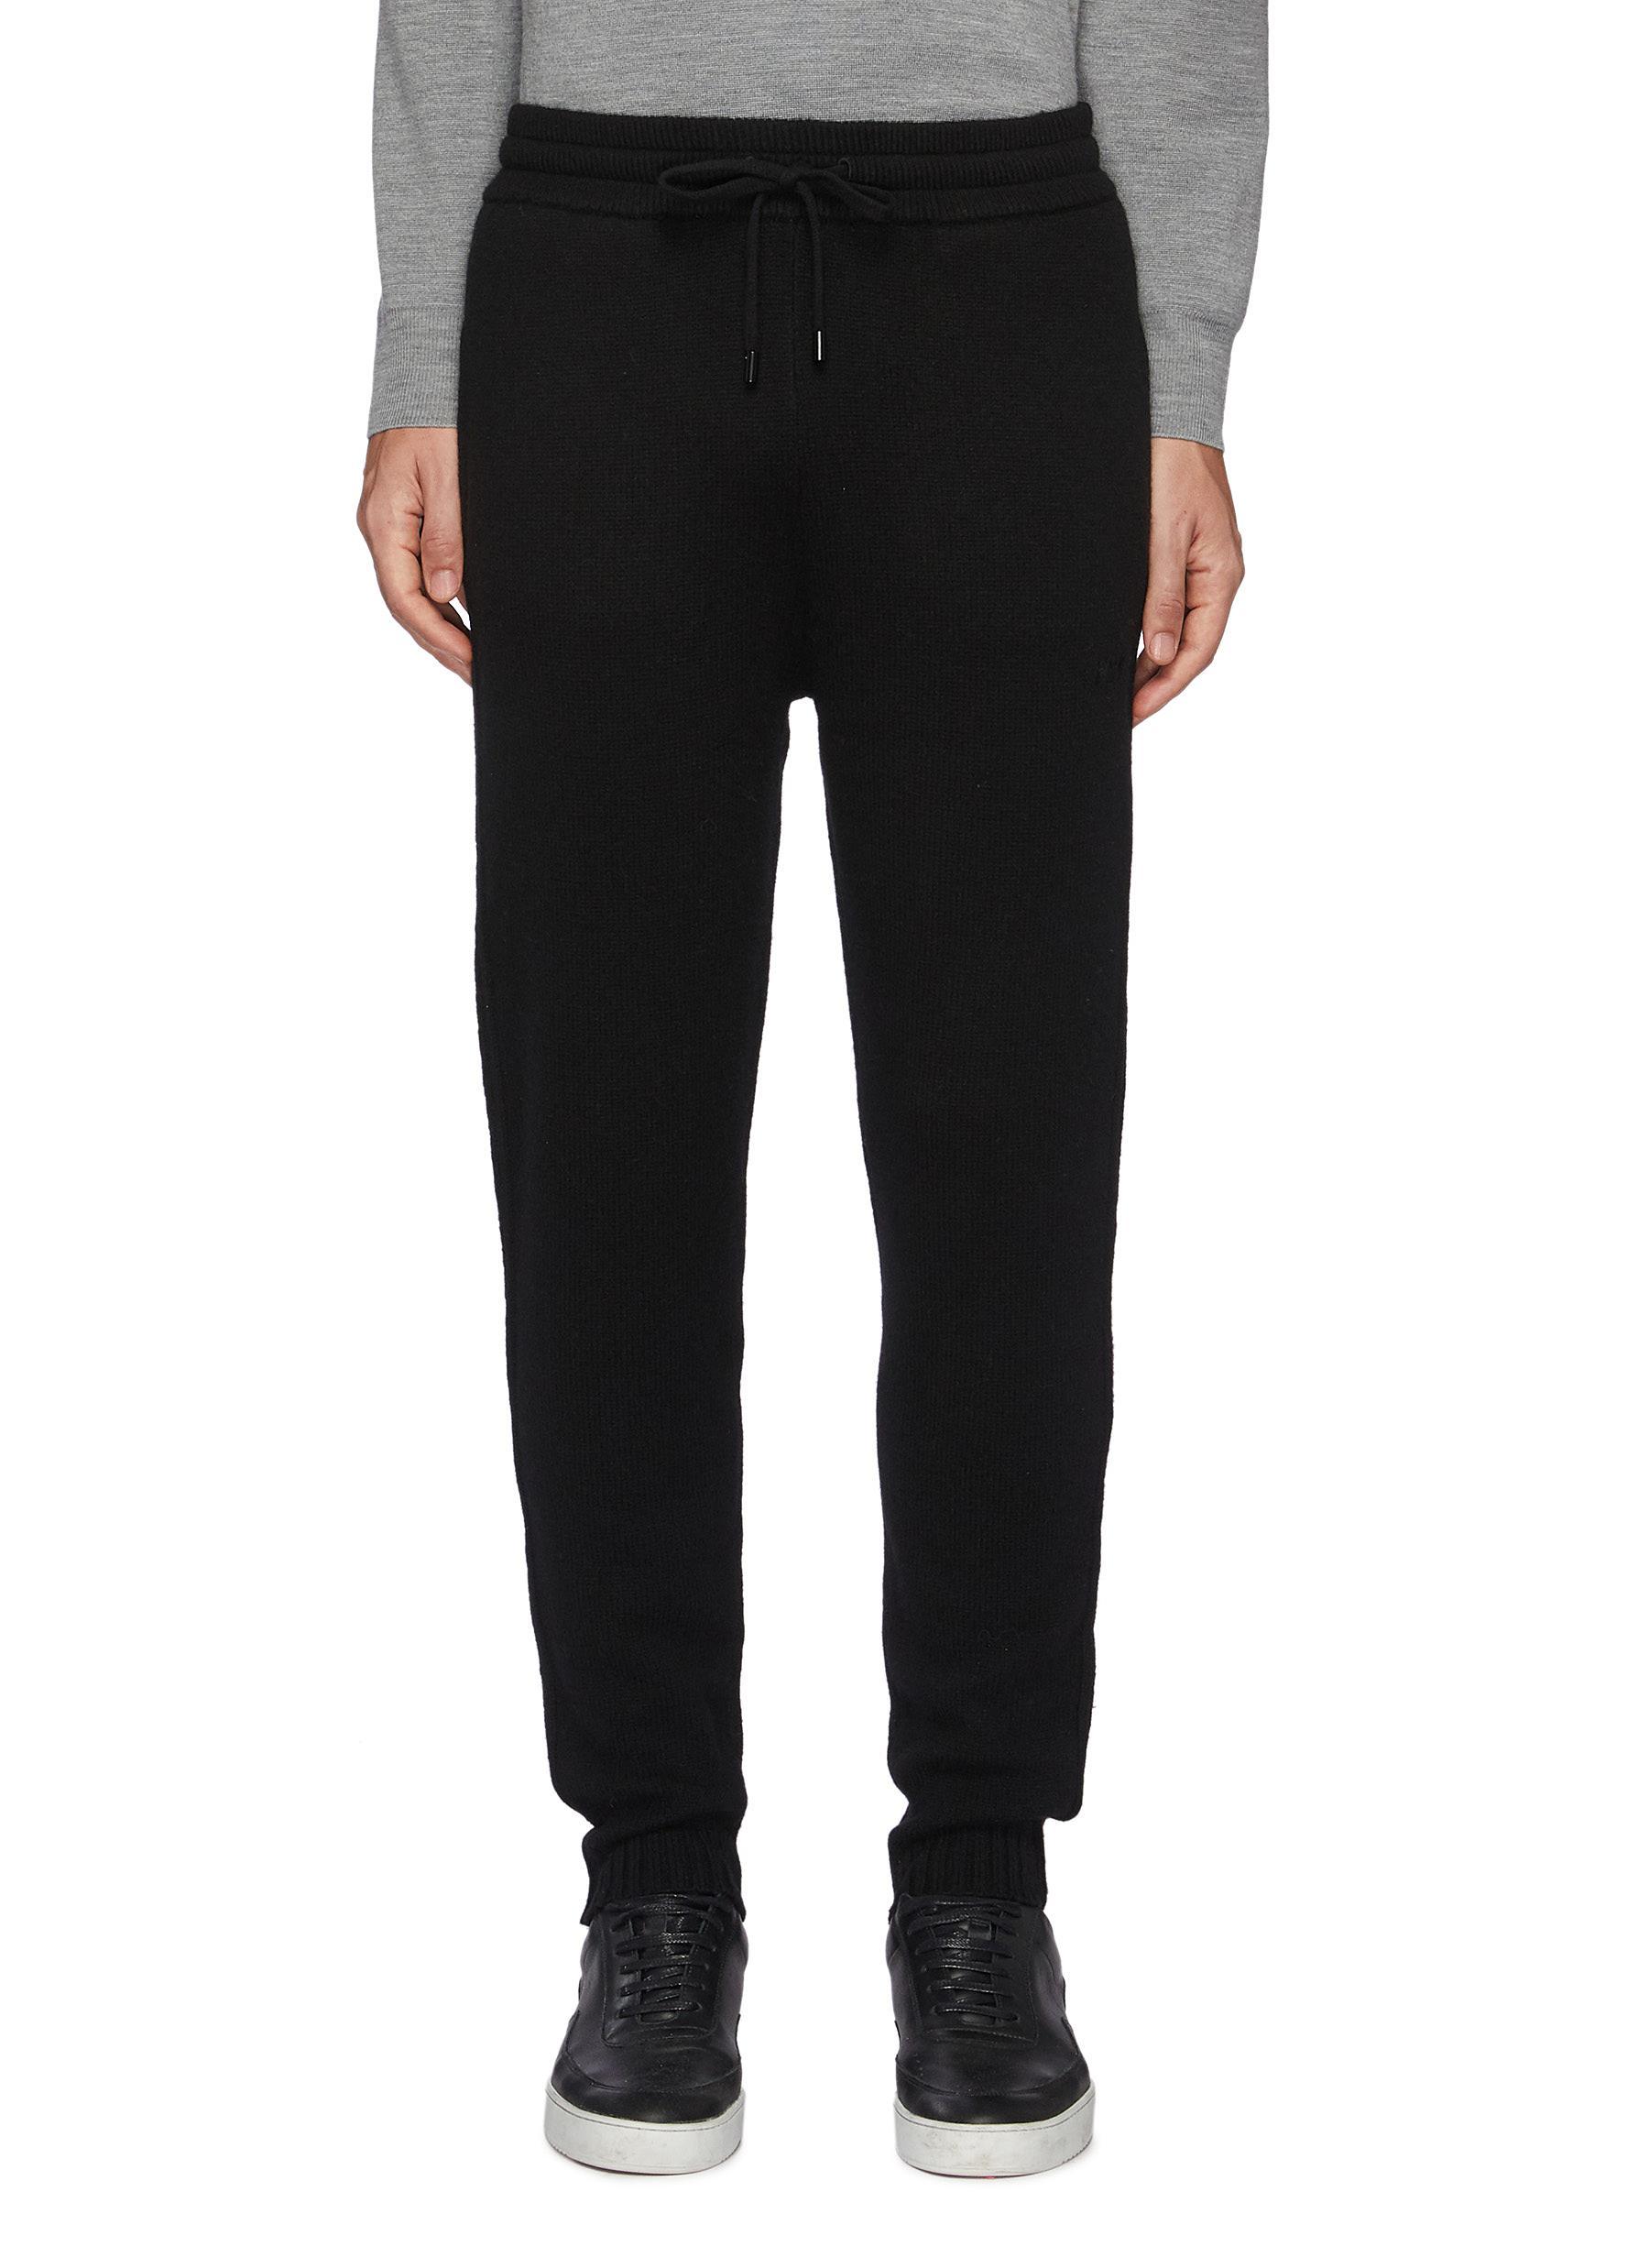 The Sweater' Drawstring Wool Jogger Pants